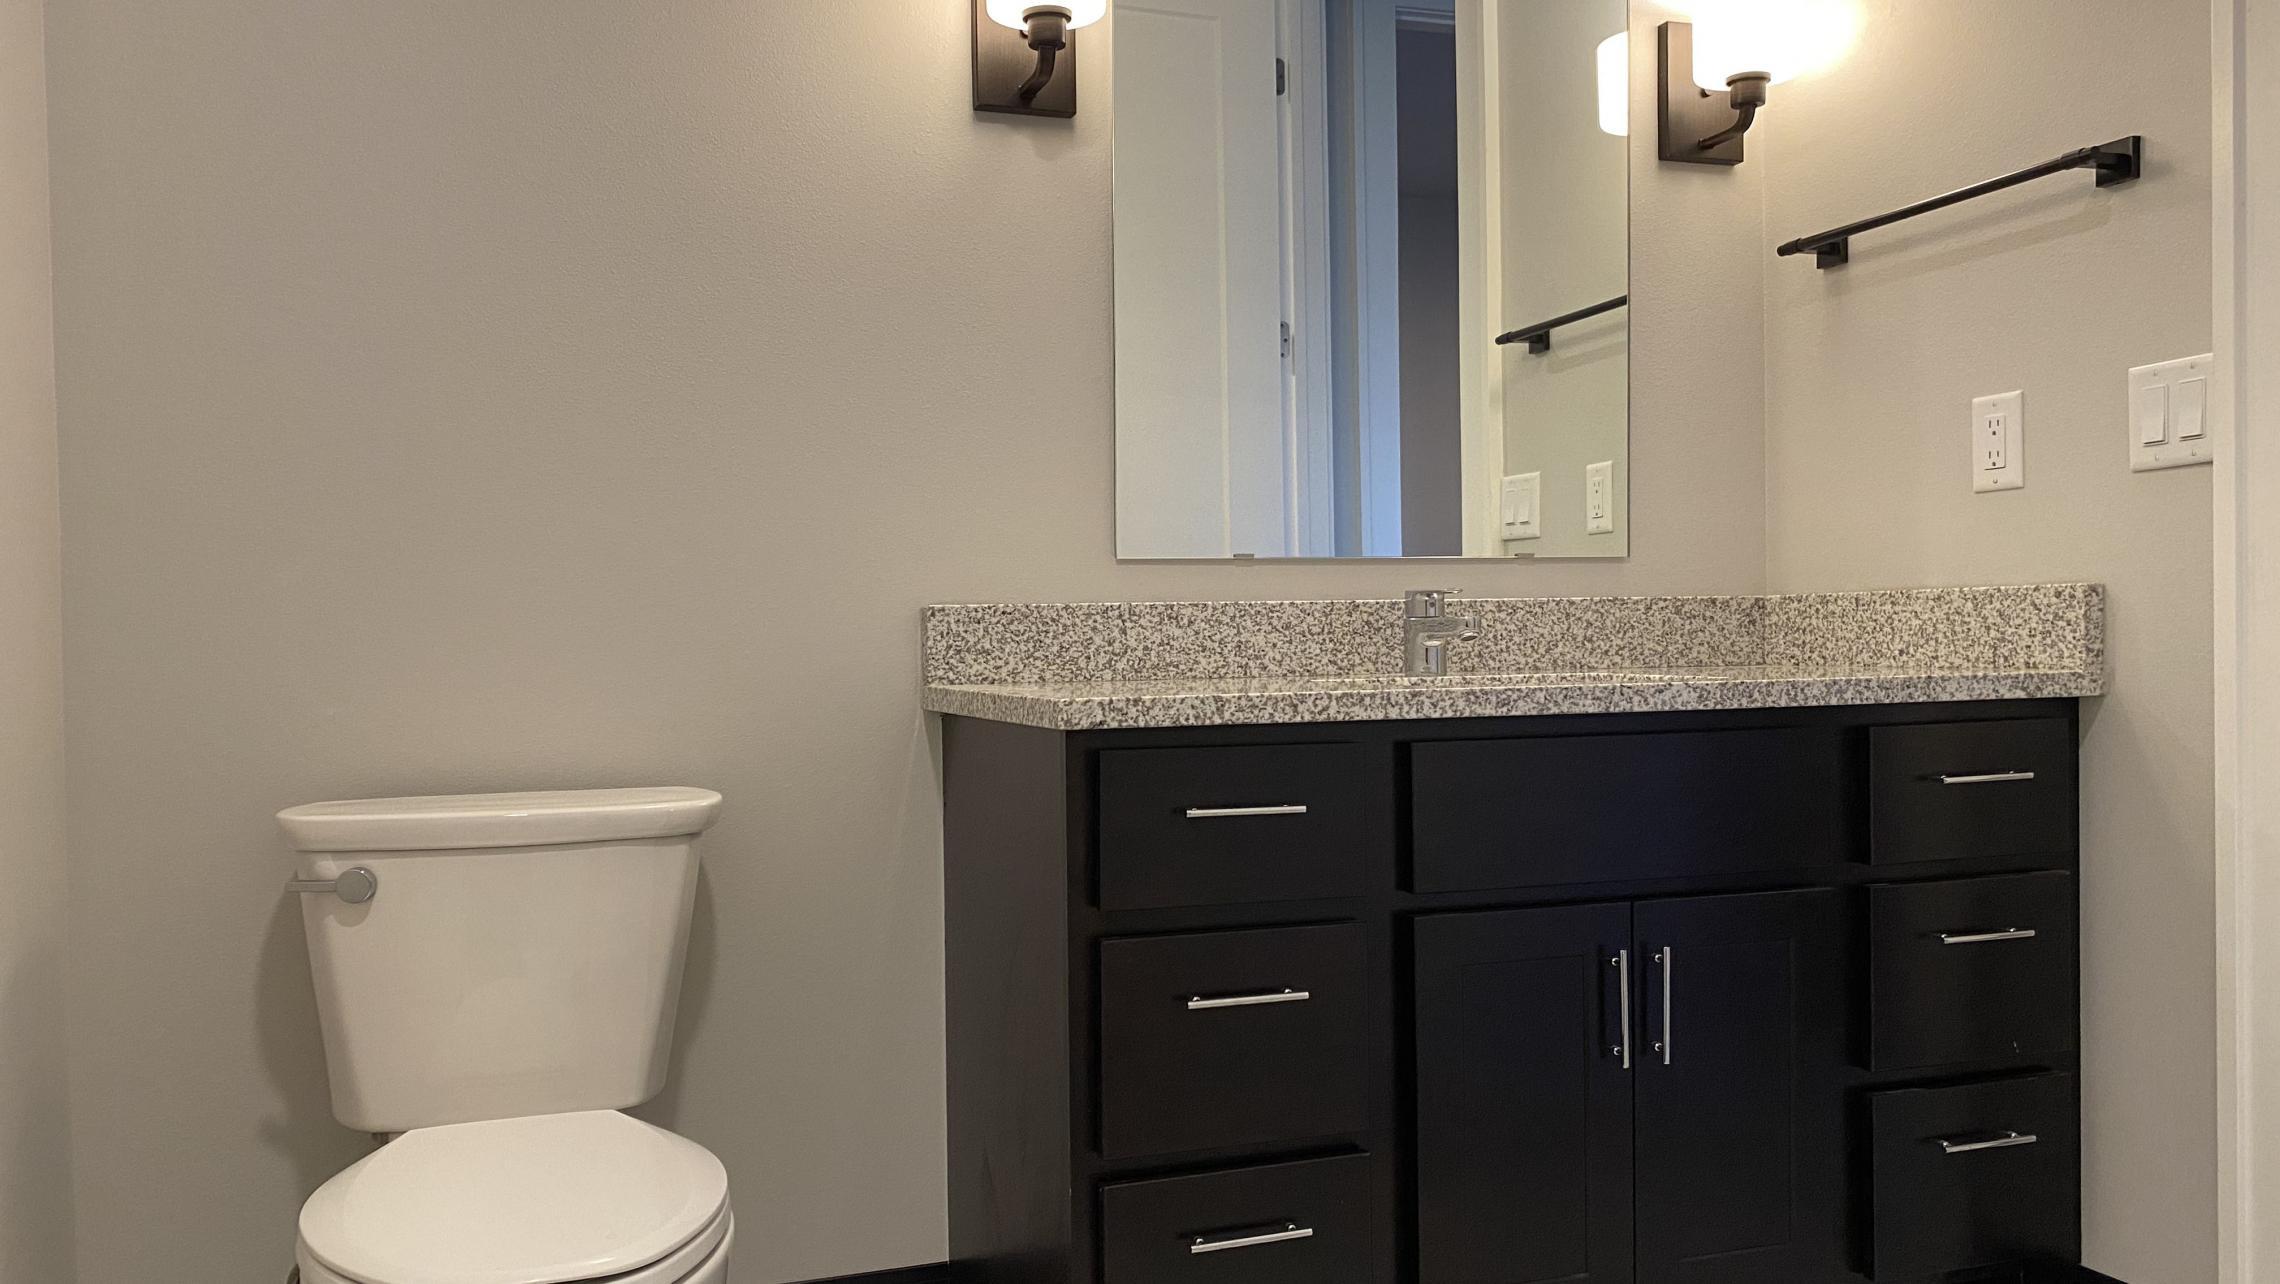 1722-Monroe-Apartments-320-Three-Bedroom-Modern-Upscale-Design-Windows-Natural-Light-Balcony-Gym-Terrace-Living-Luxury-Lounge-Madison-Views-Bathroom-Vanity